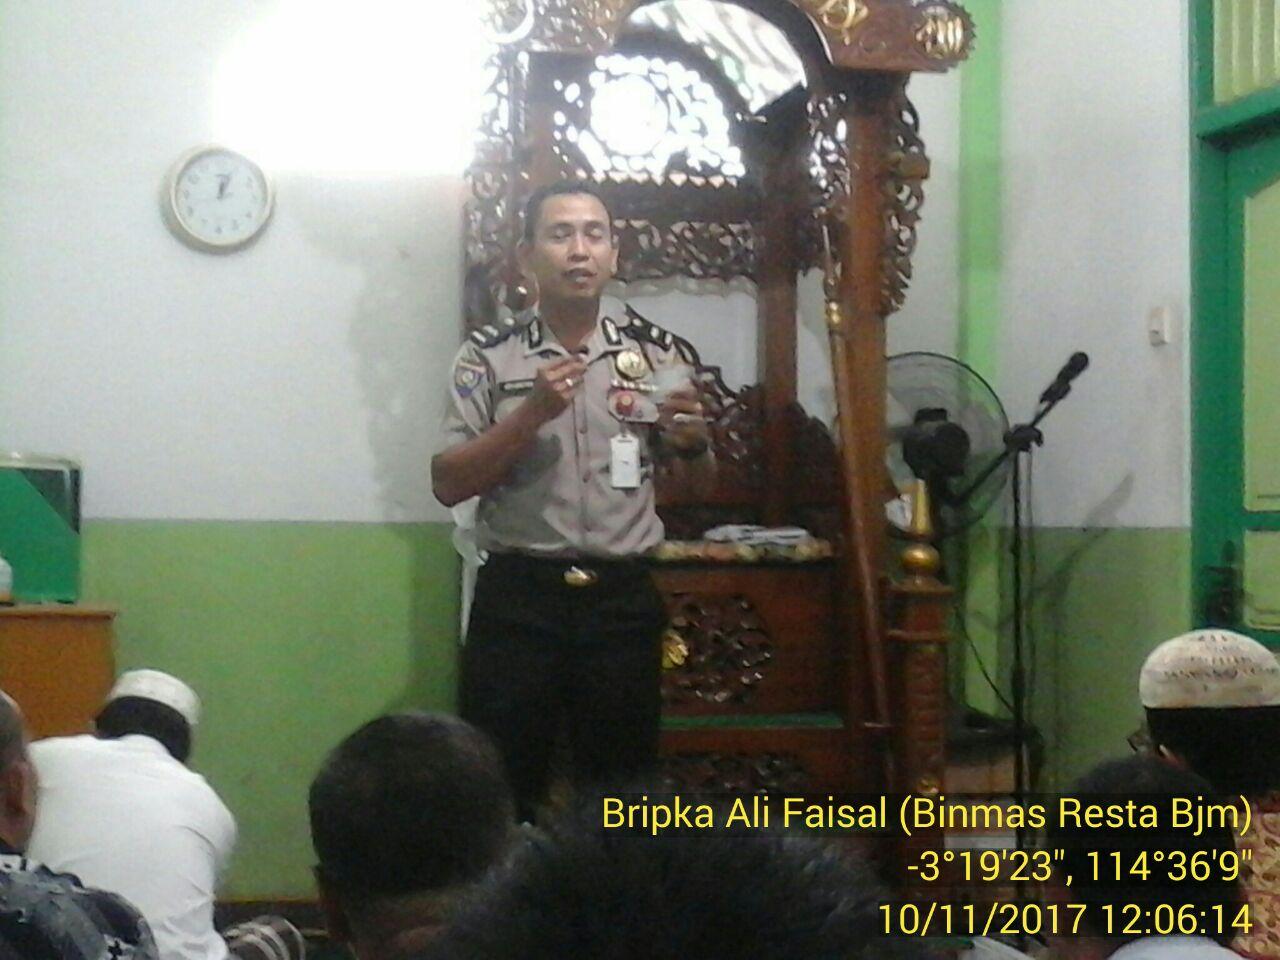 Polresta Banjarmasin : Ada Polisi di Mesjid AL- Falah Duta Mall Banjarmasin, Begini Ceritanya?